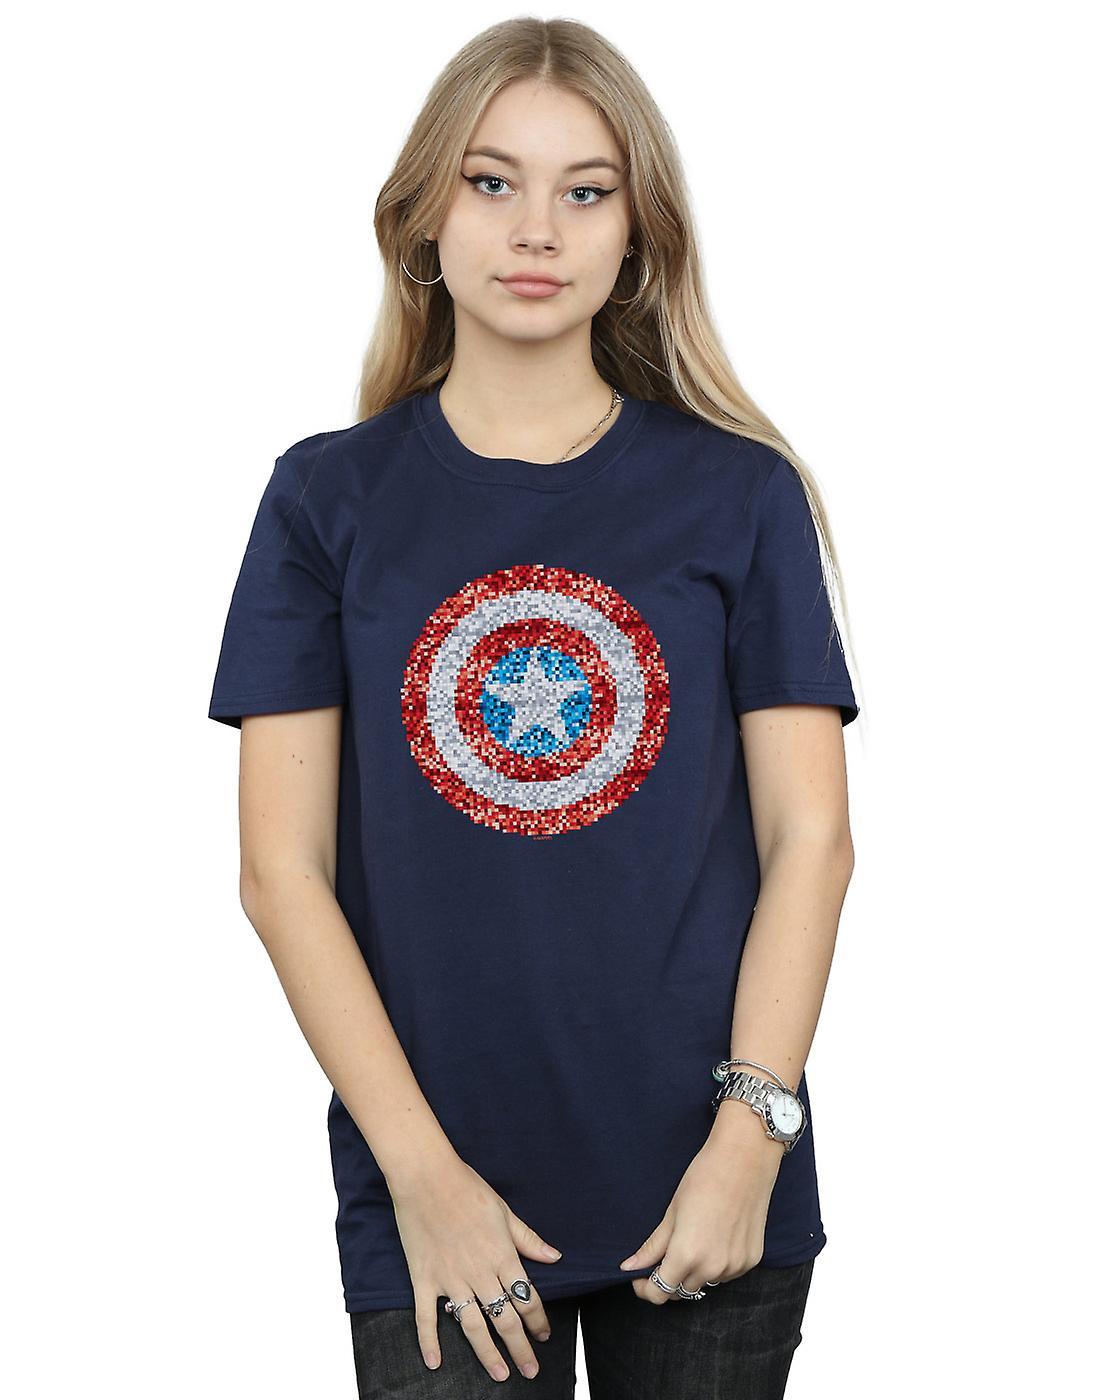 Marvel Women's Captain America Pixelated Shield Boyfriend Fit T-Shirt